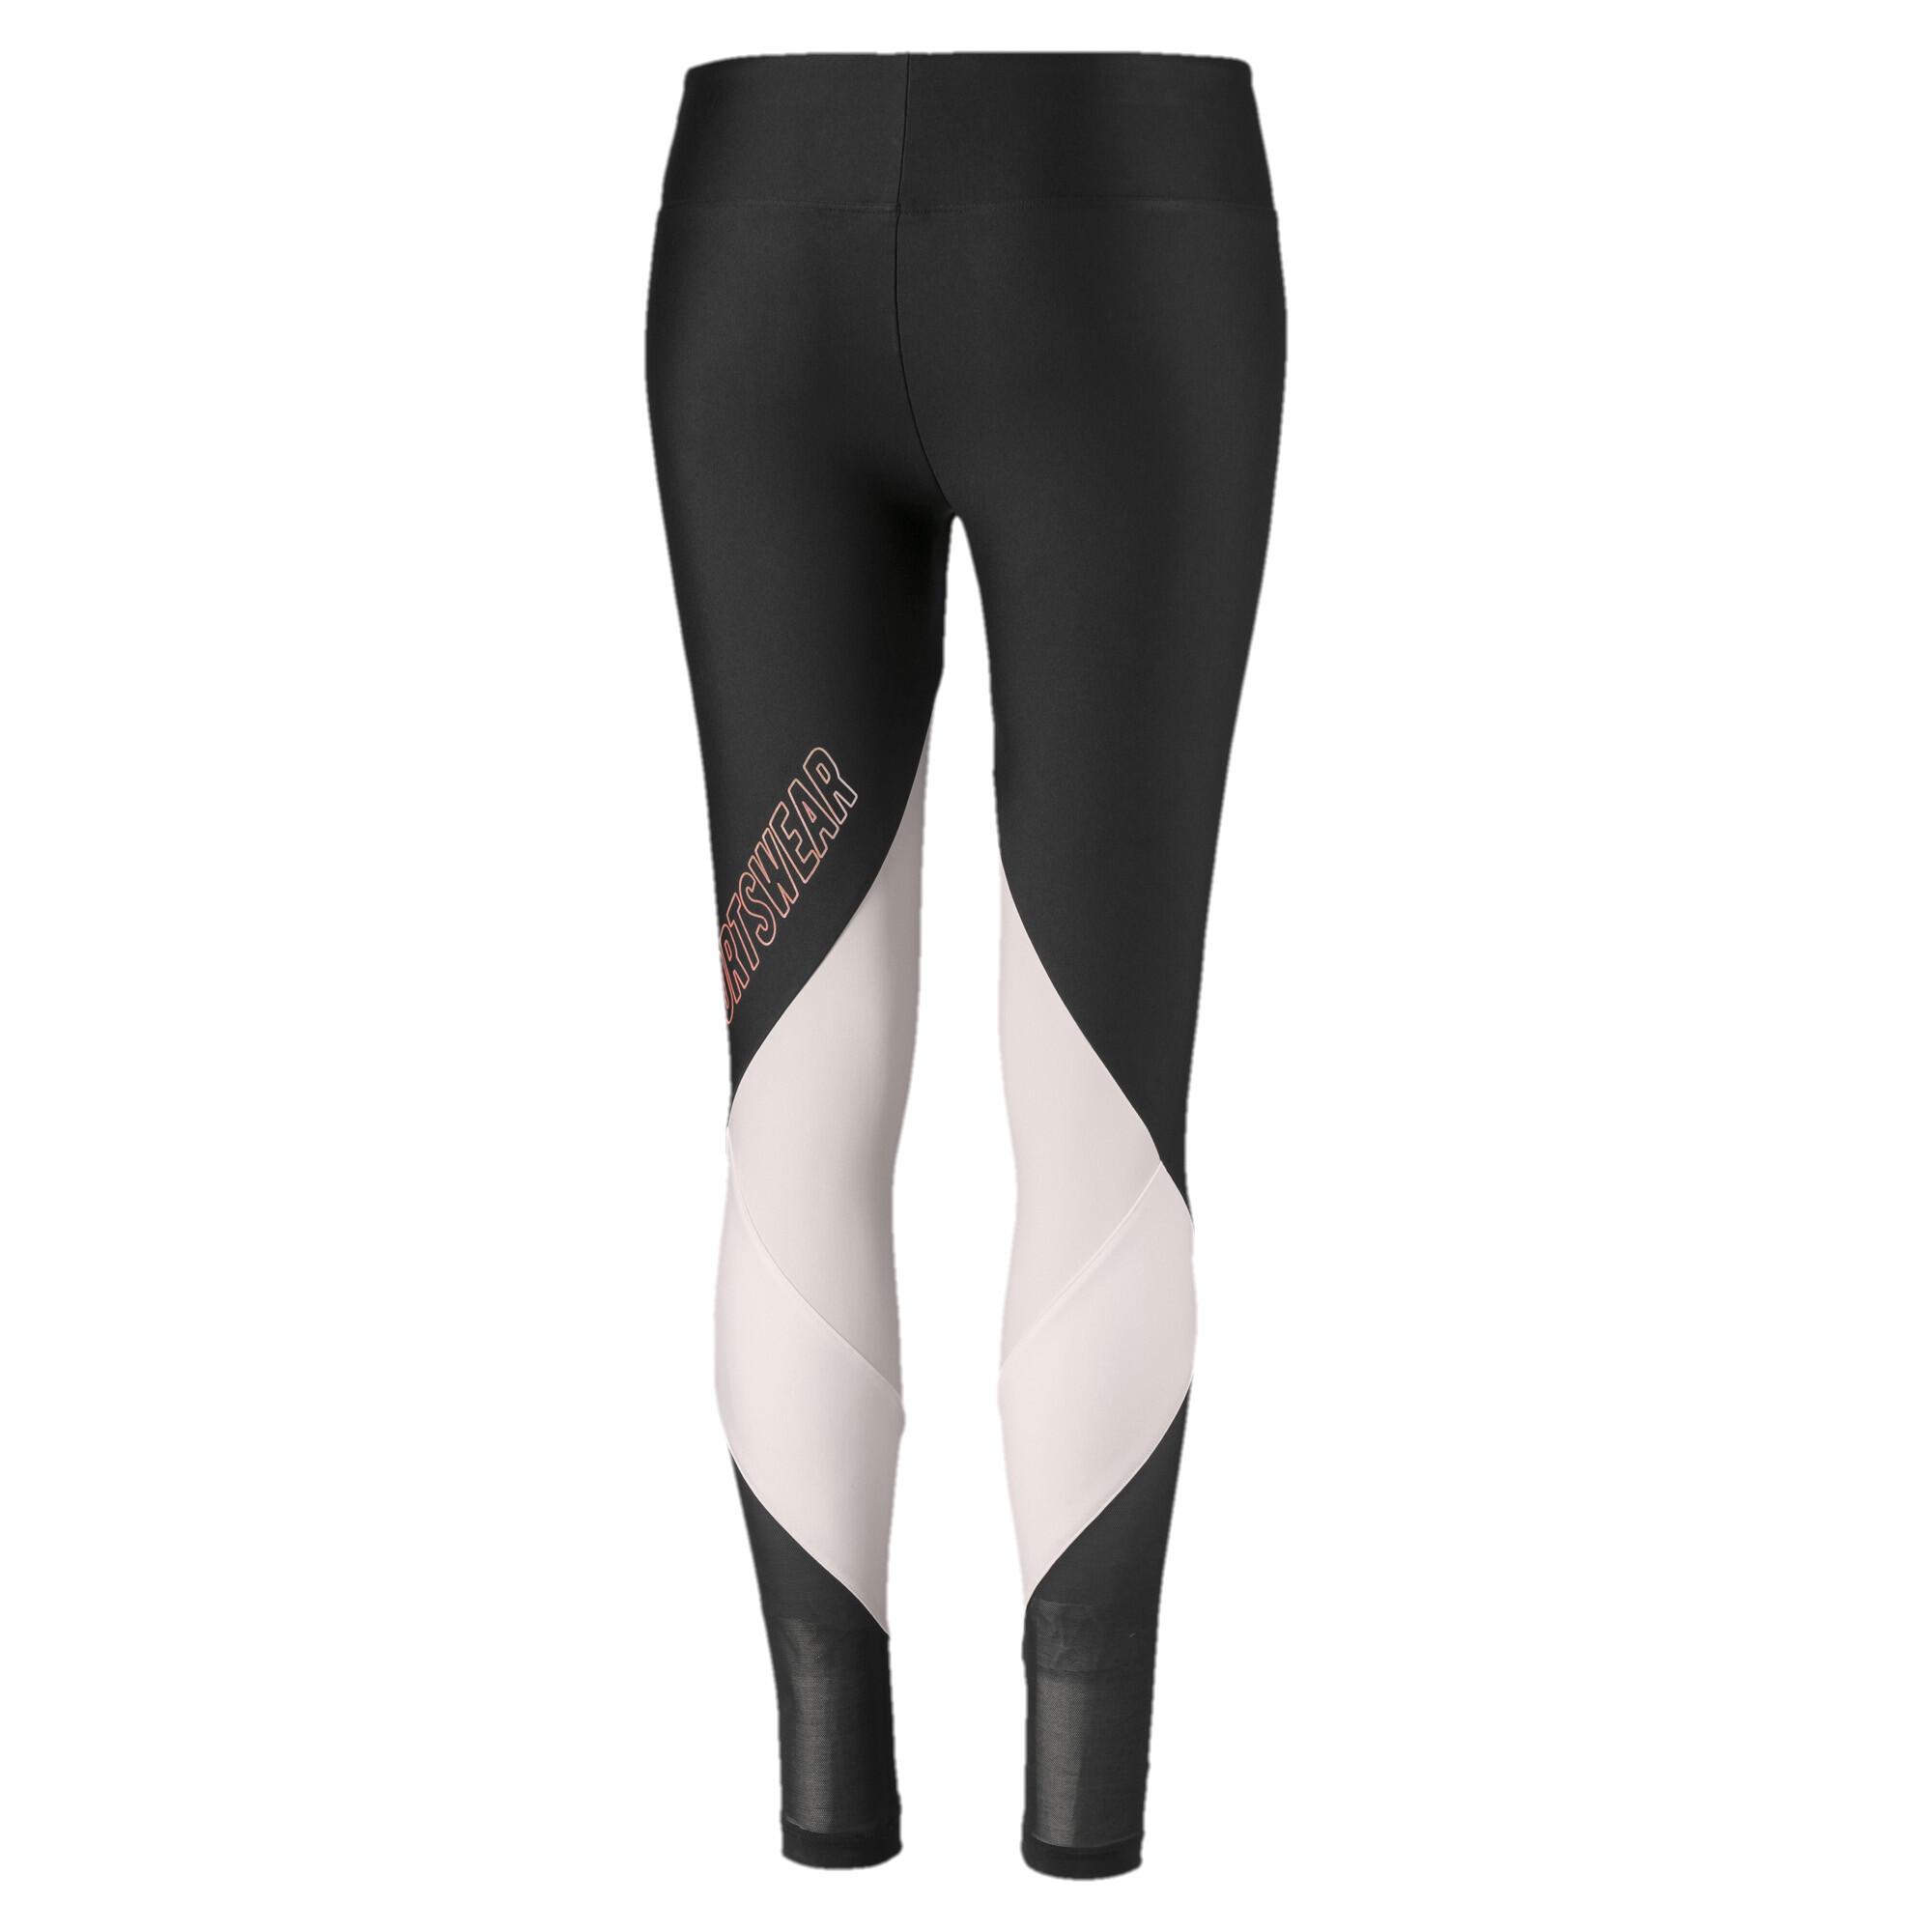 PUMA-luXTG-Women-s-Leggings-Sport-Classics thumbnail 3